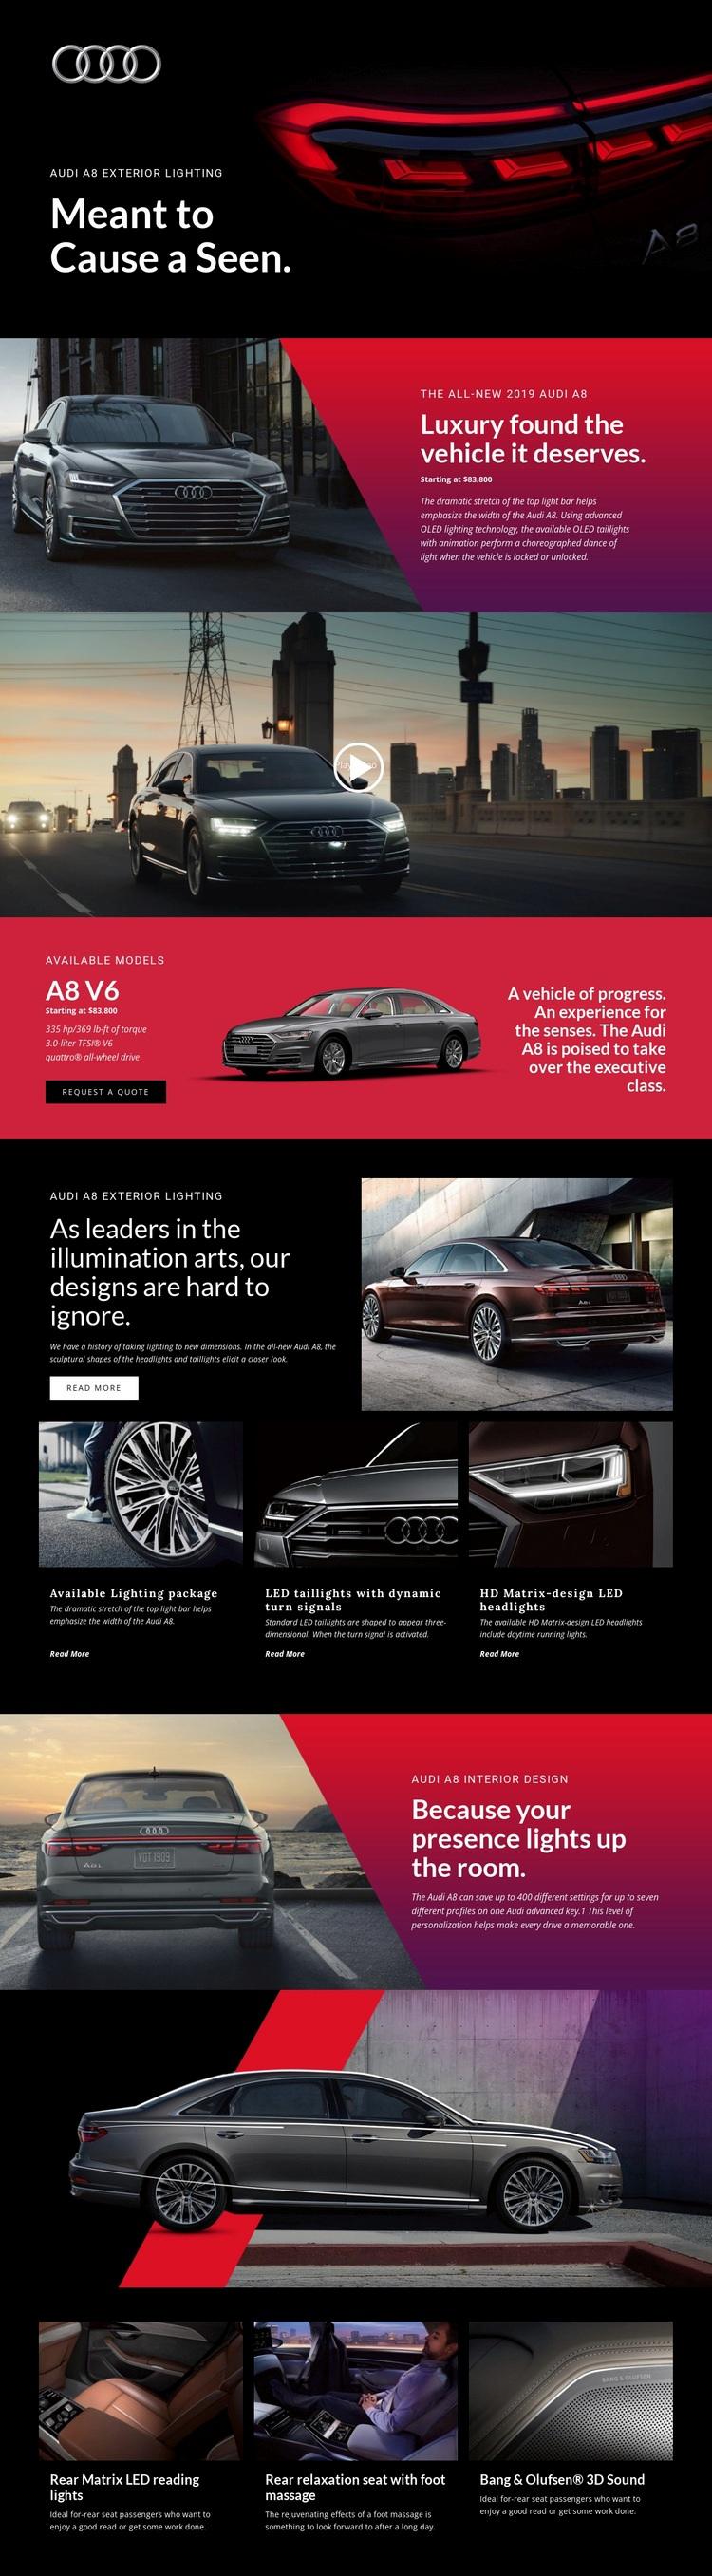 Audi luxury cars Html Code Example